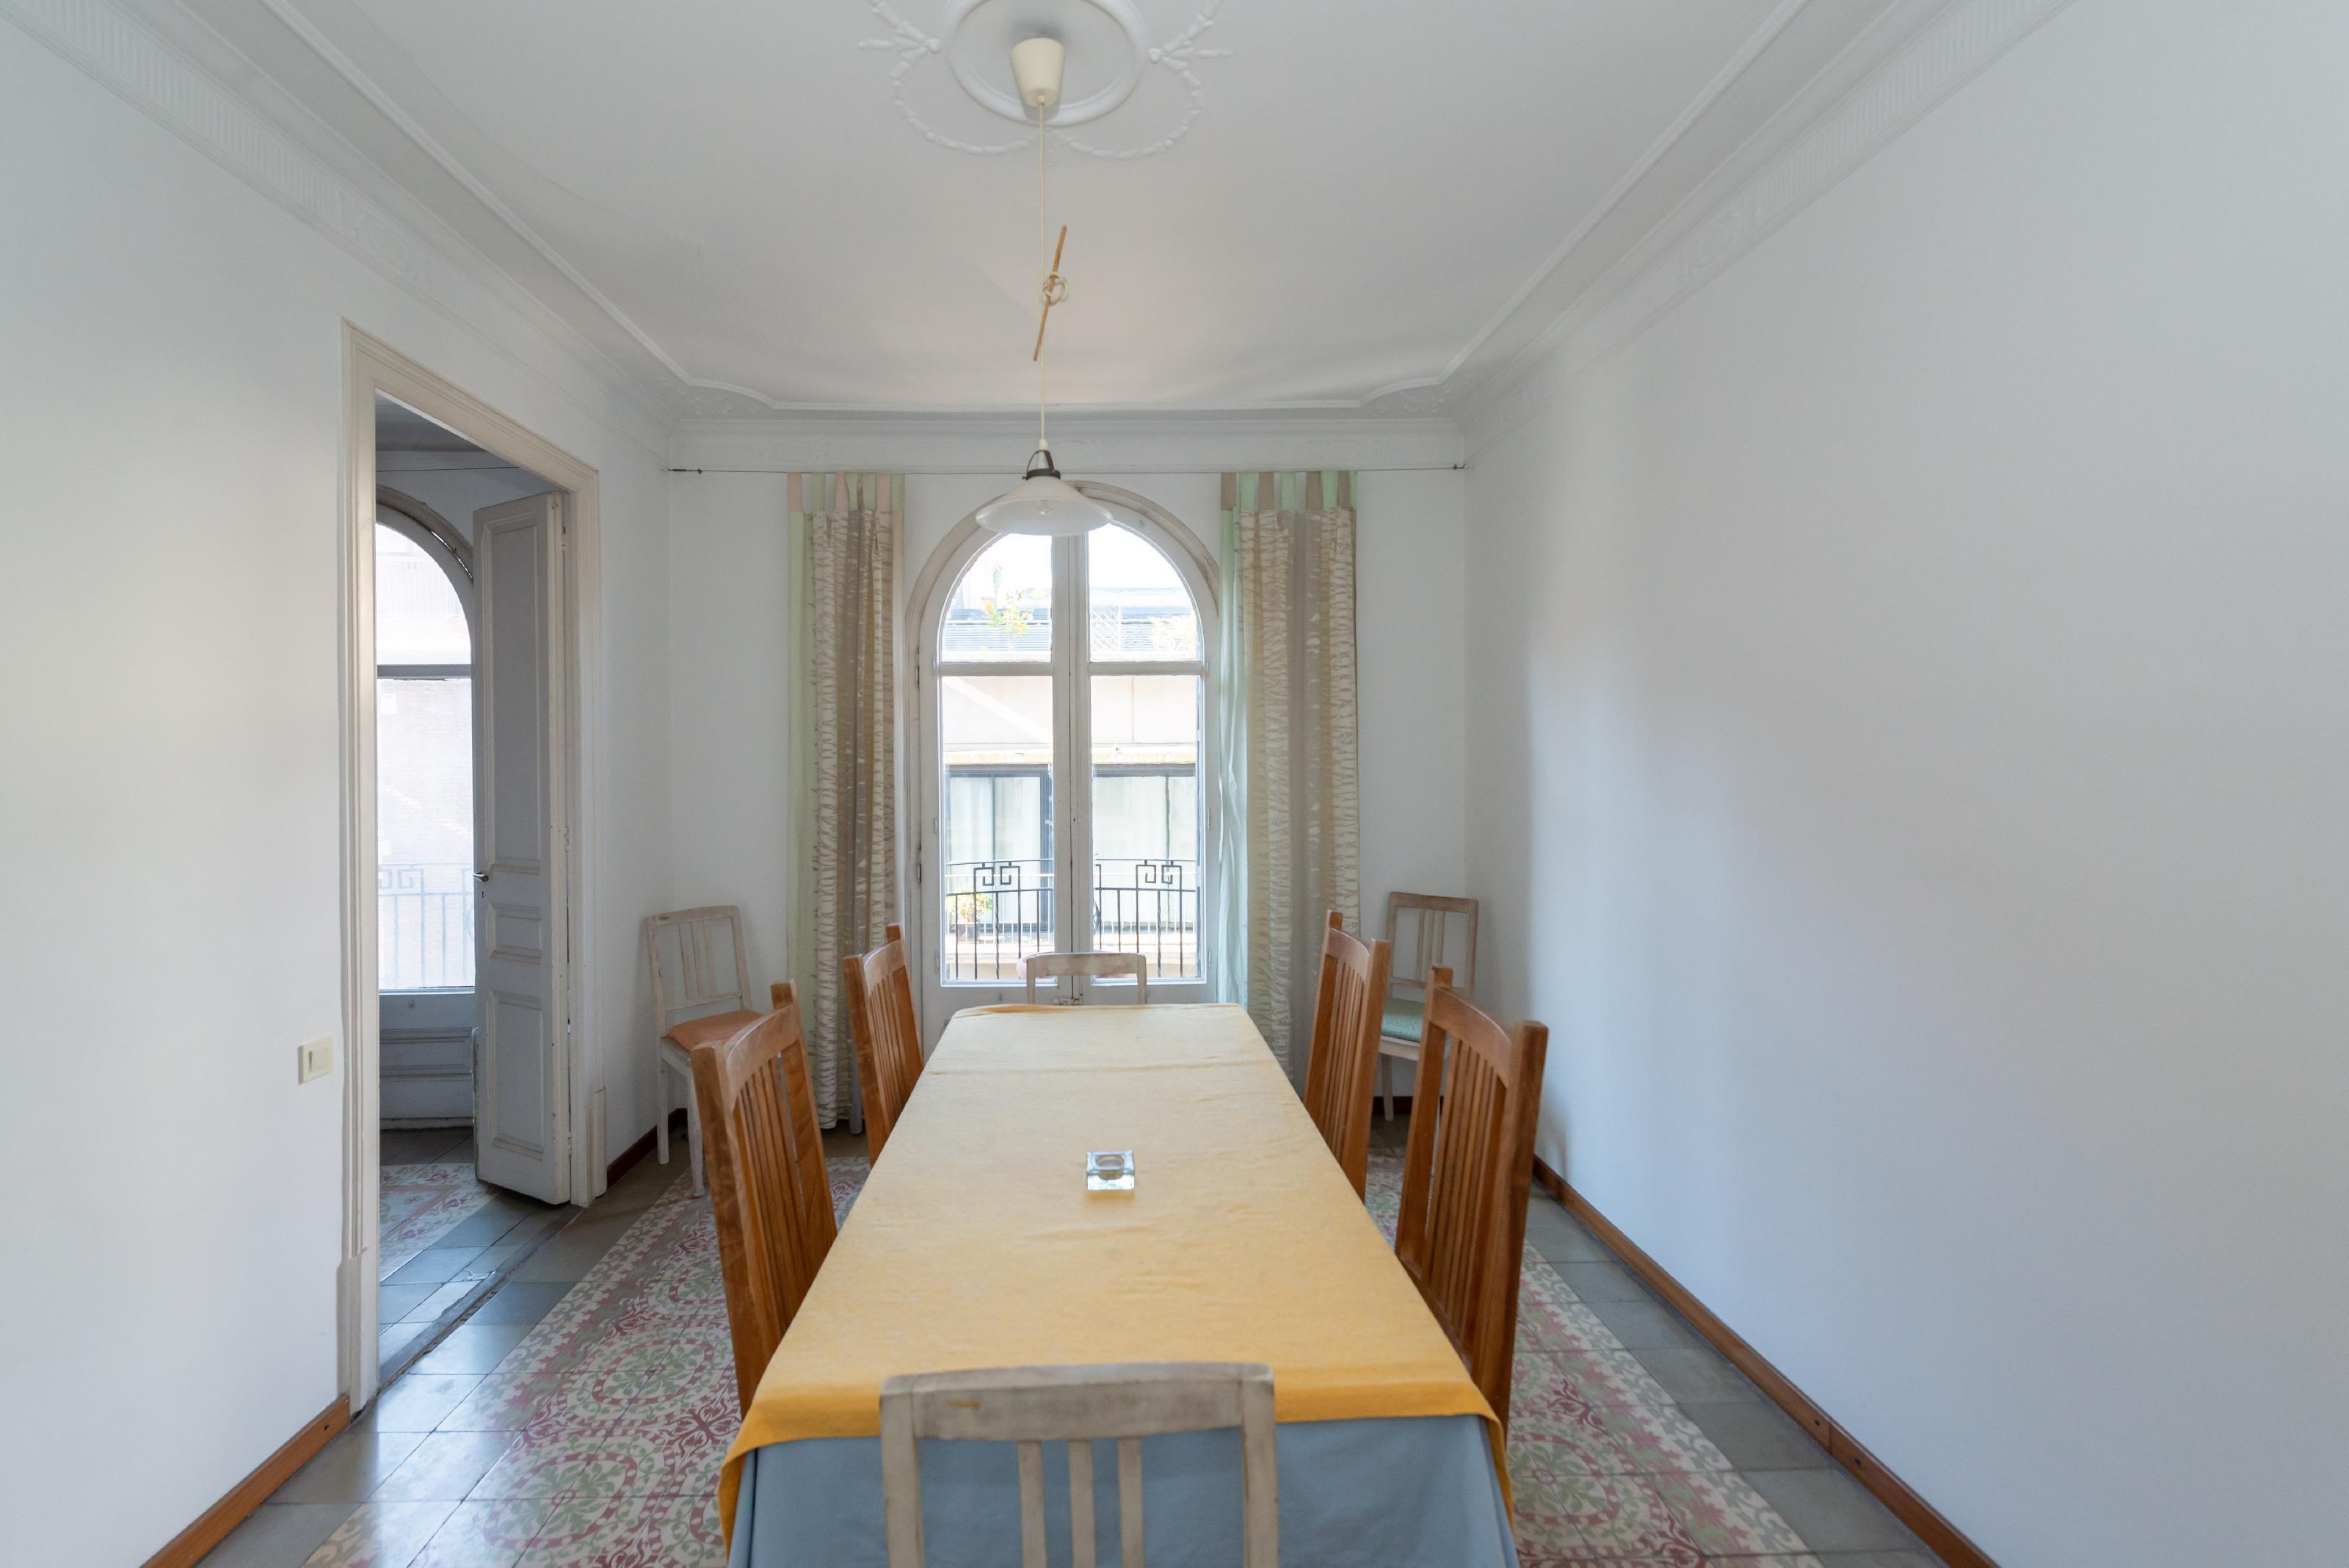 250582 Flat for sale in Sarrià-Sant Gervasi, Sant Gervasi-Galvany 20